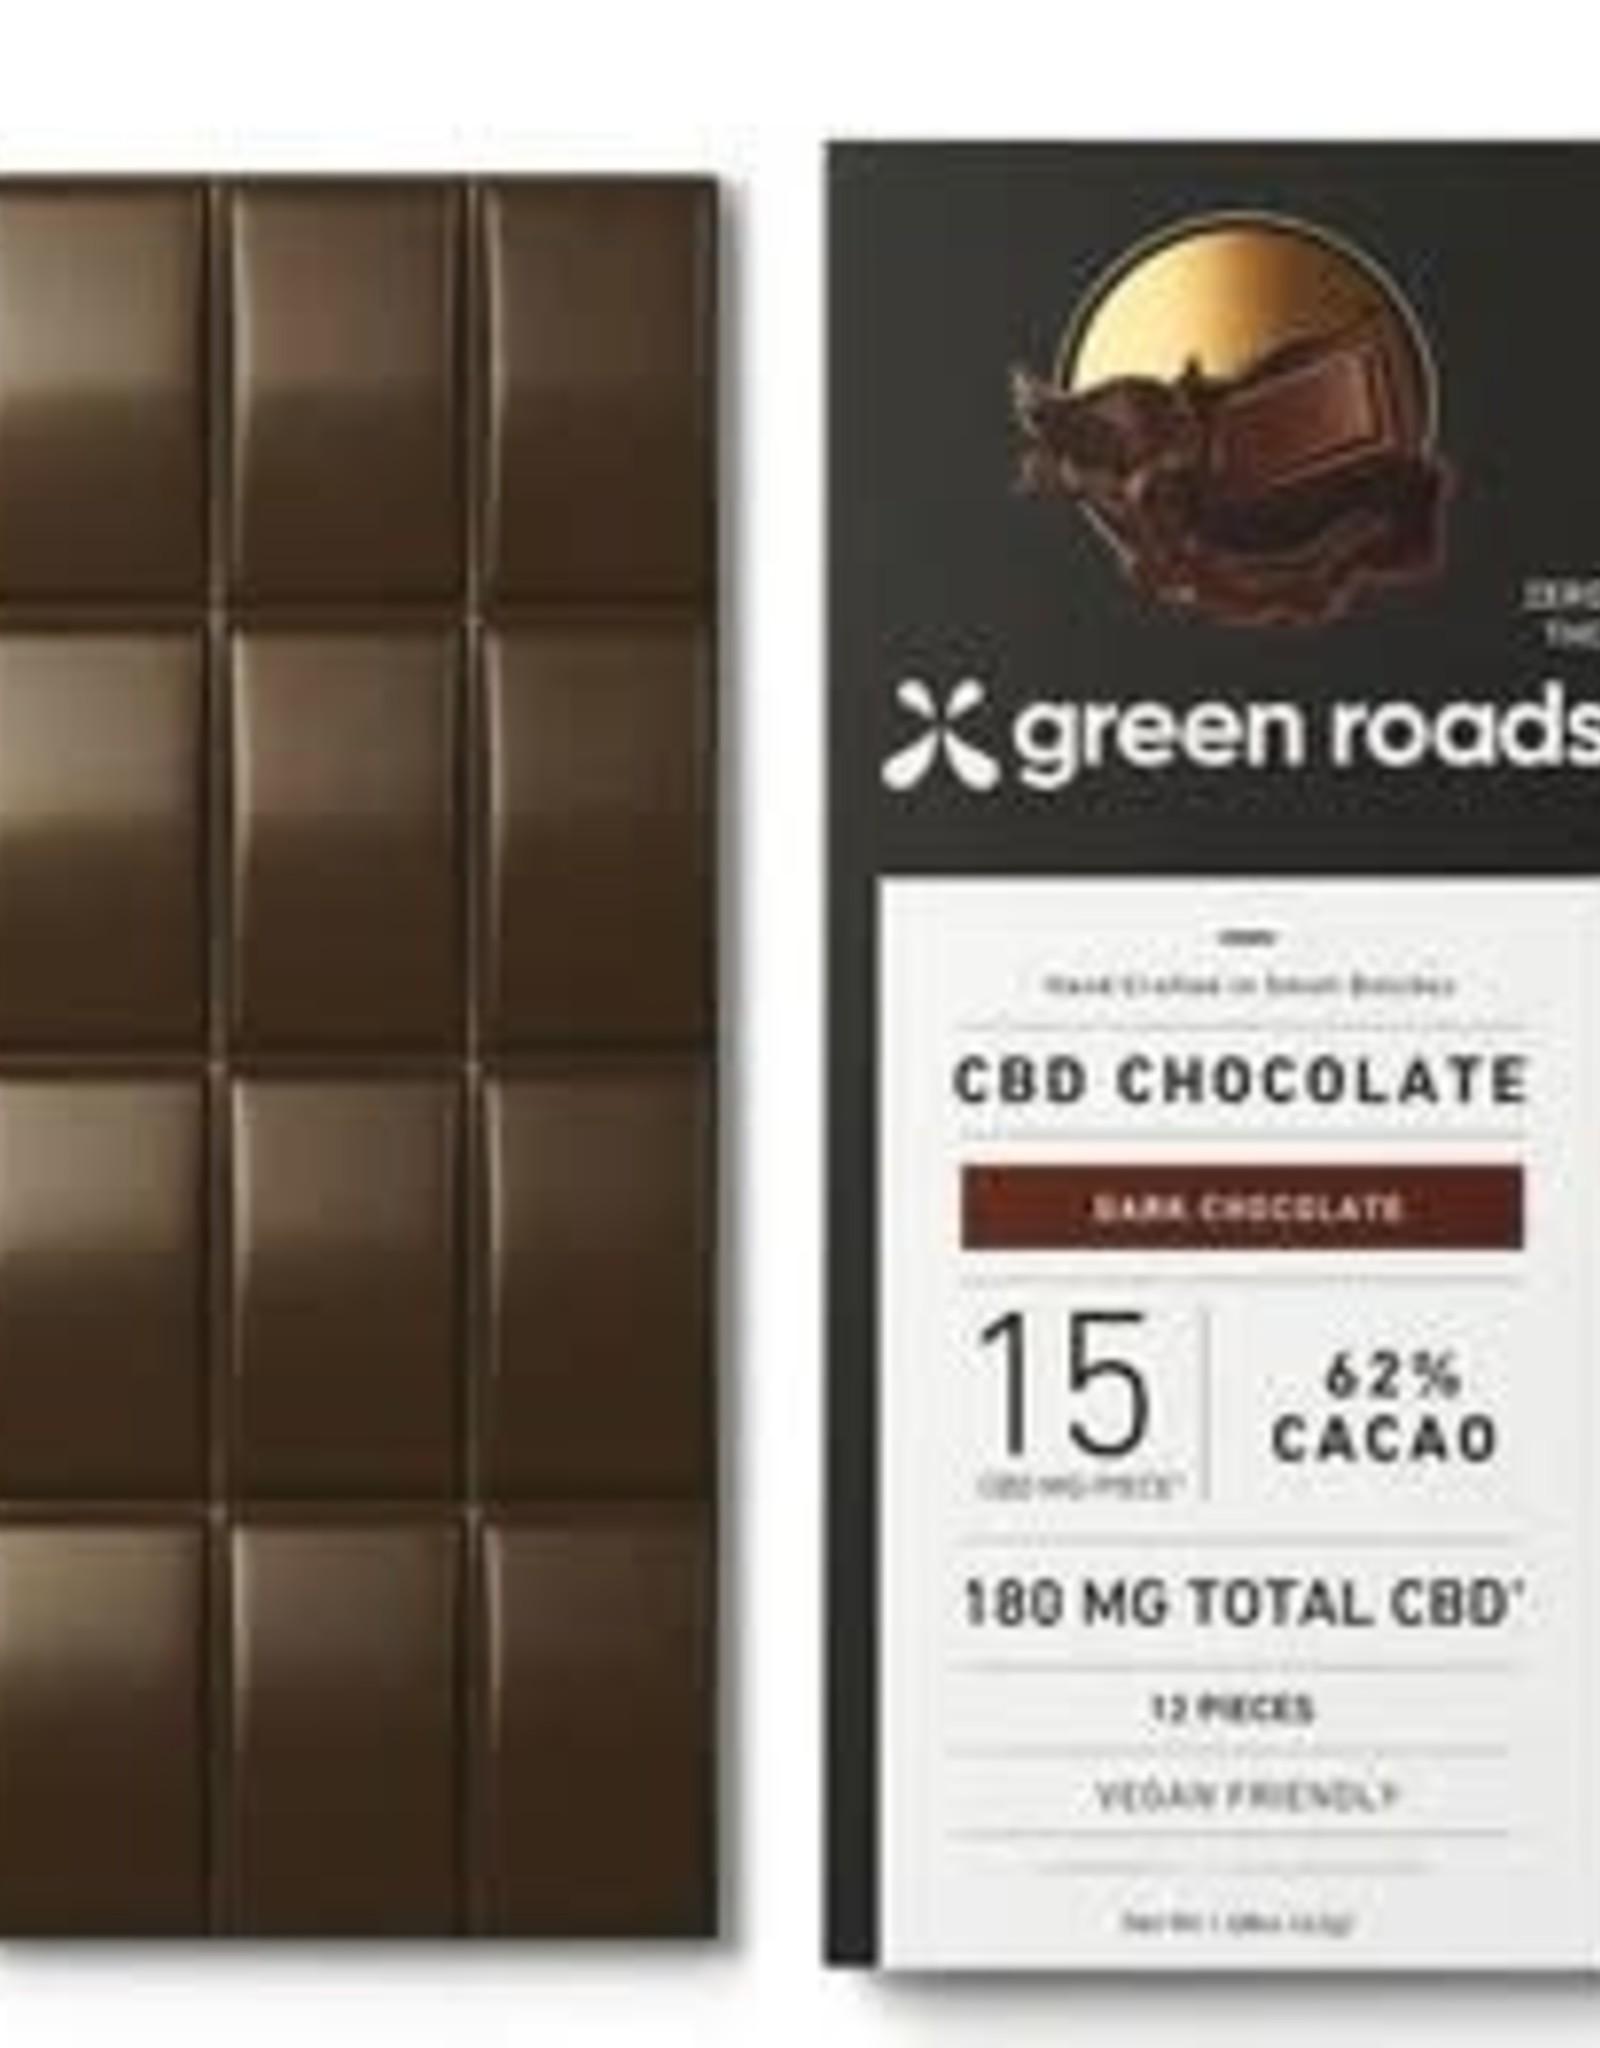 Green Roads Green Roads CBD Dark Chocolate